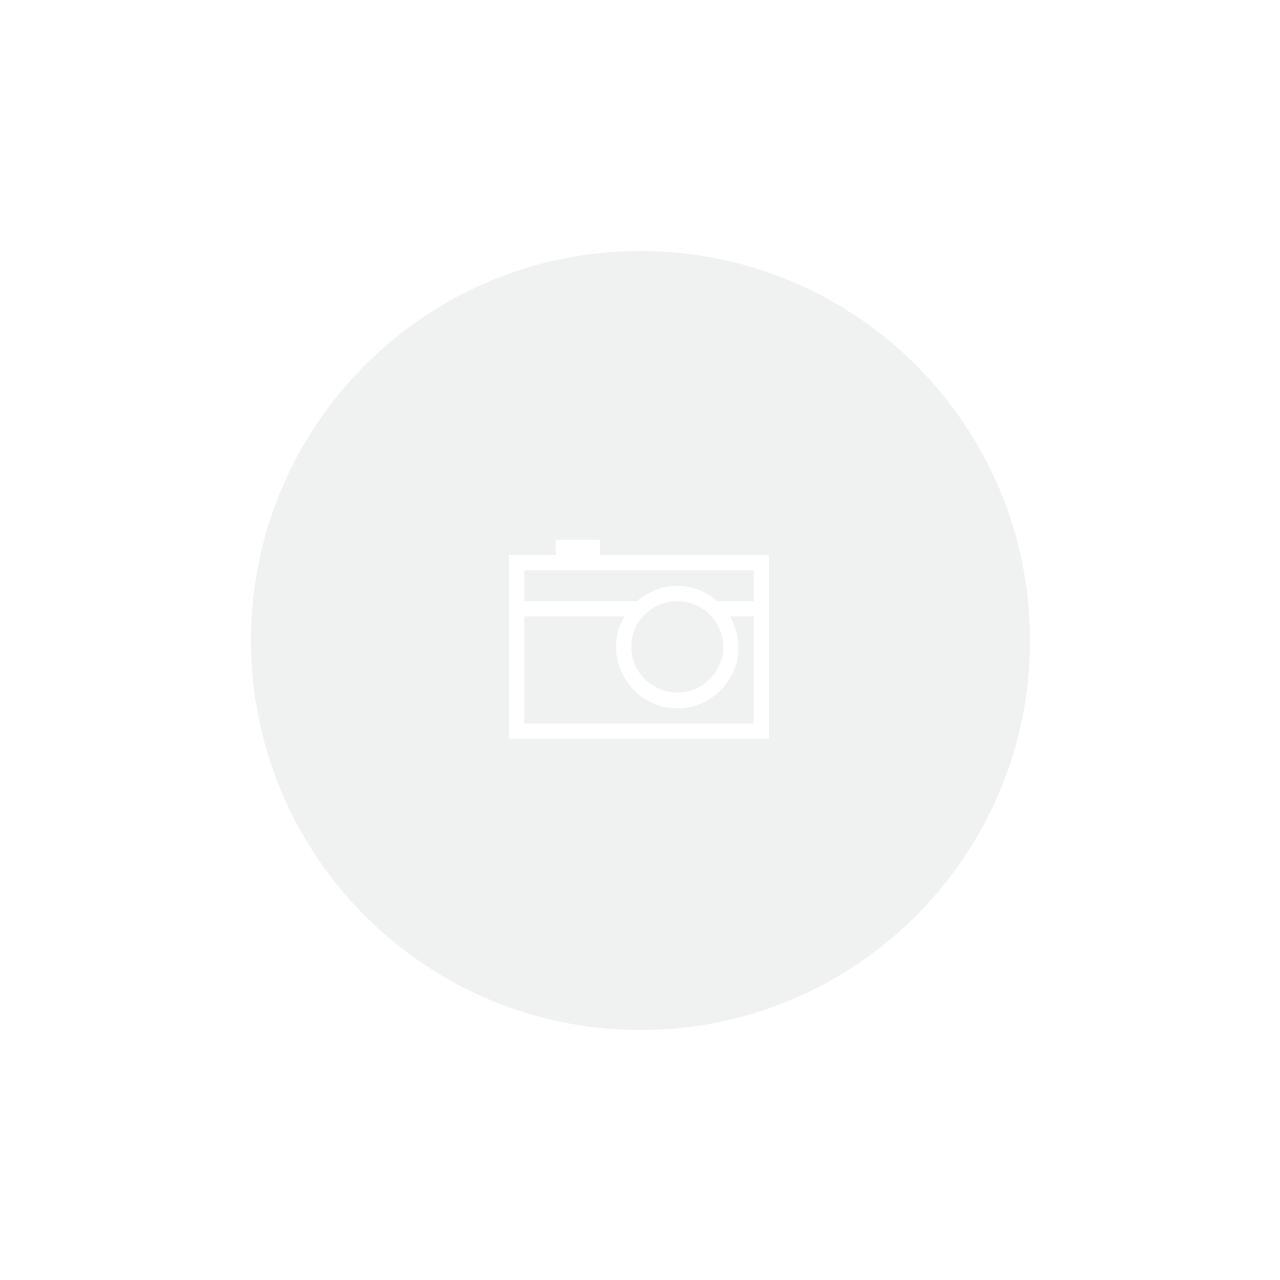 Cozi-Pasta Inox 24Cm 8,00 Litros Profissional Tramontina